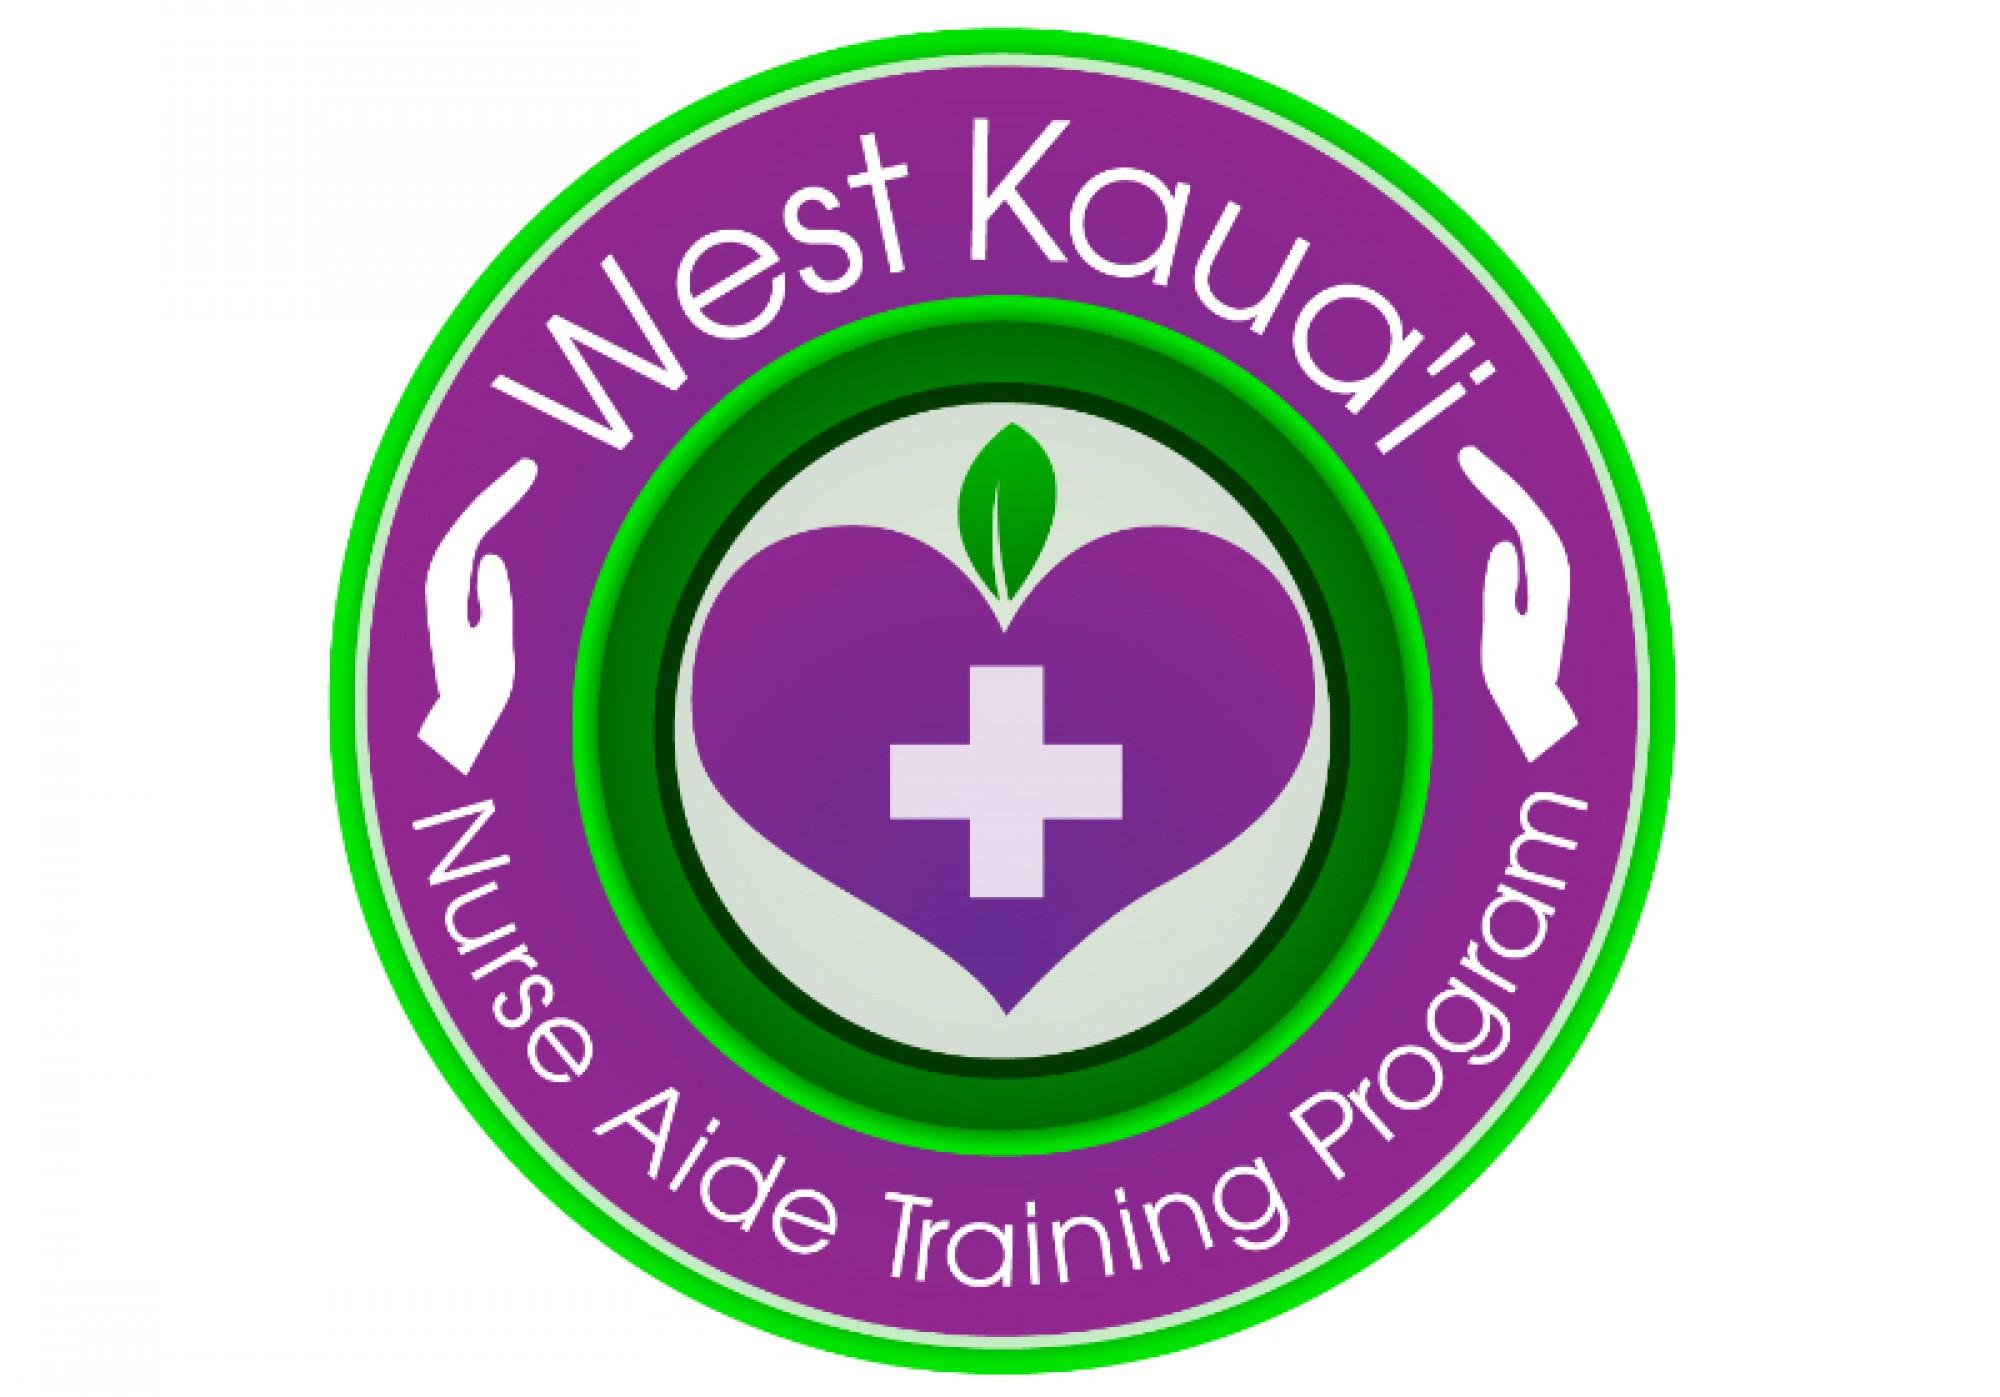 West kauai nurse aide training program xflitez Gallery